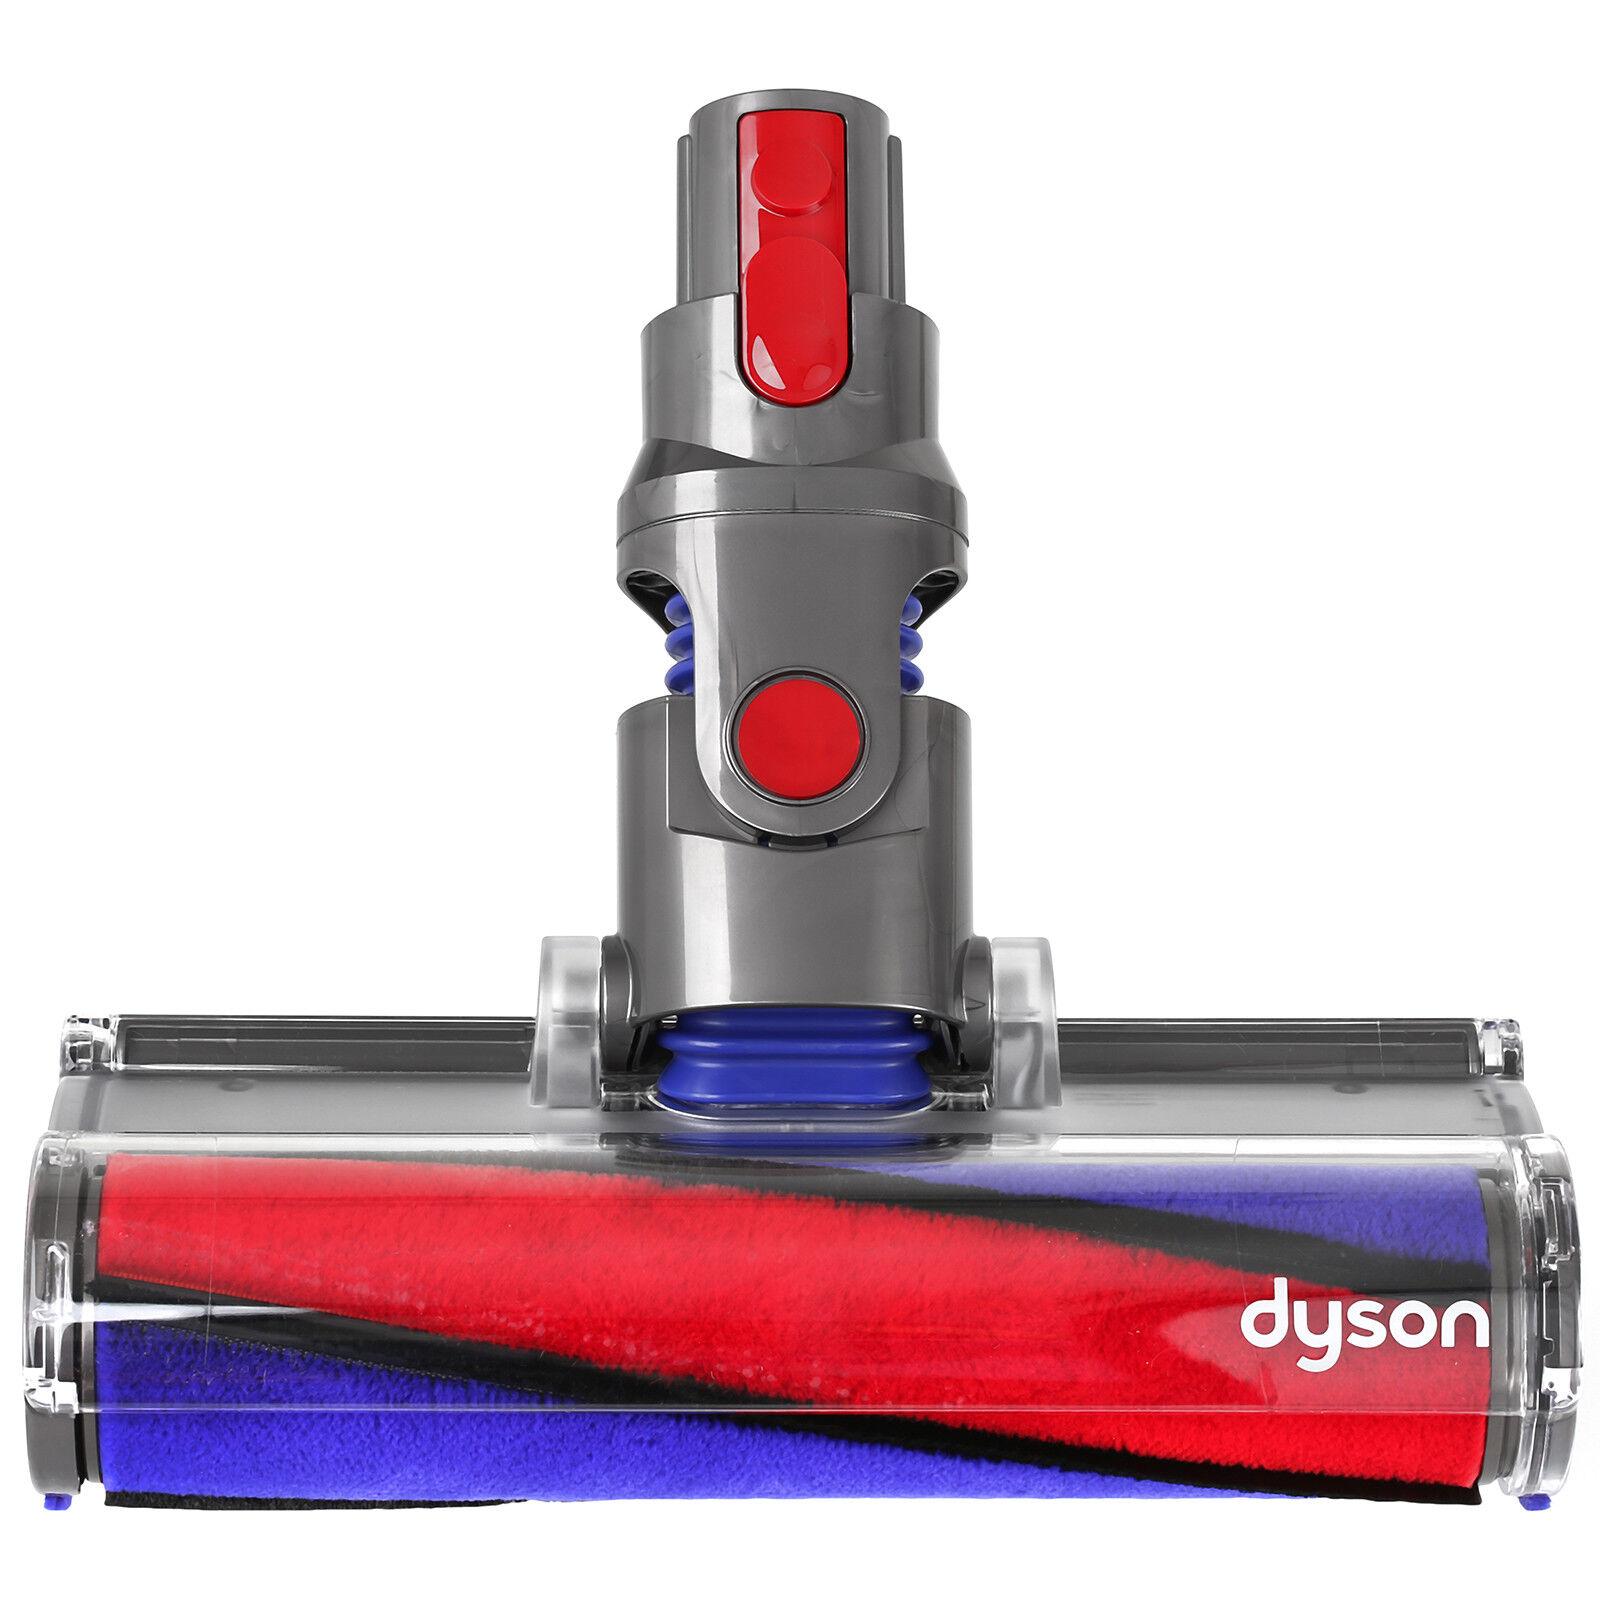 Genuine Dyson V7 Total Clean Red SV11 Vacuum Soft Roller Flo